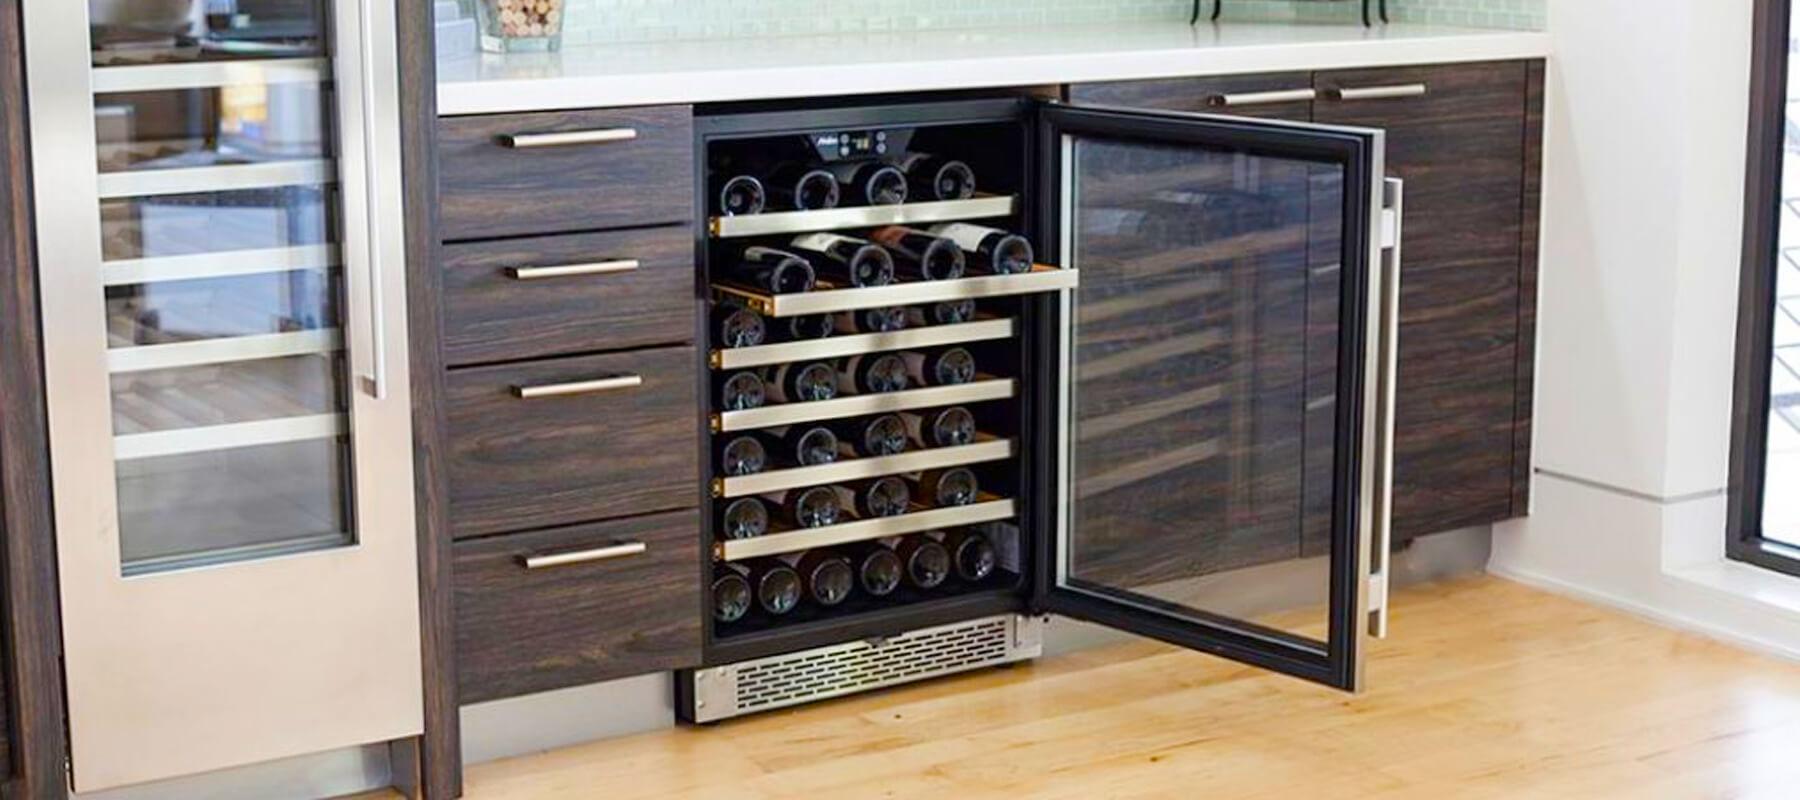 Built in Wine Refrigerator Undercounter Irwindale   Built-in Refrigerator Repair